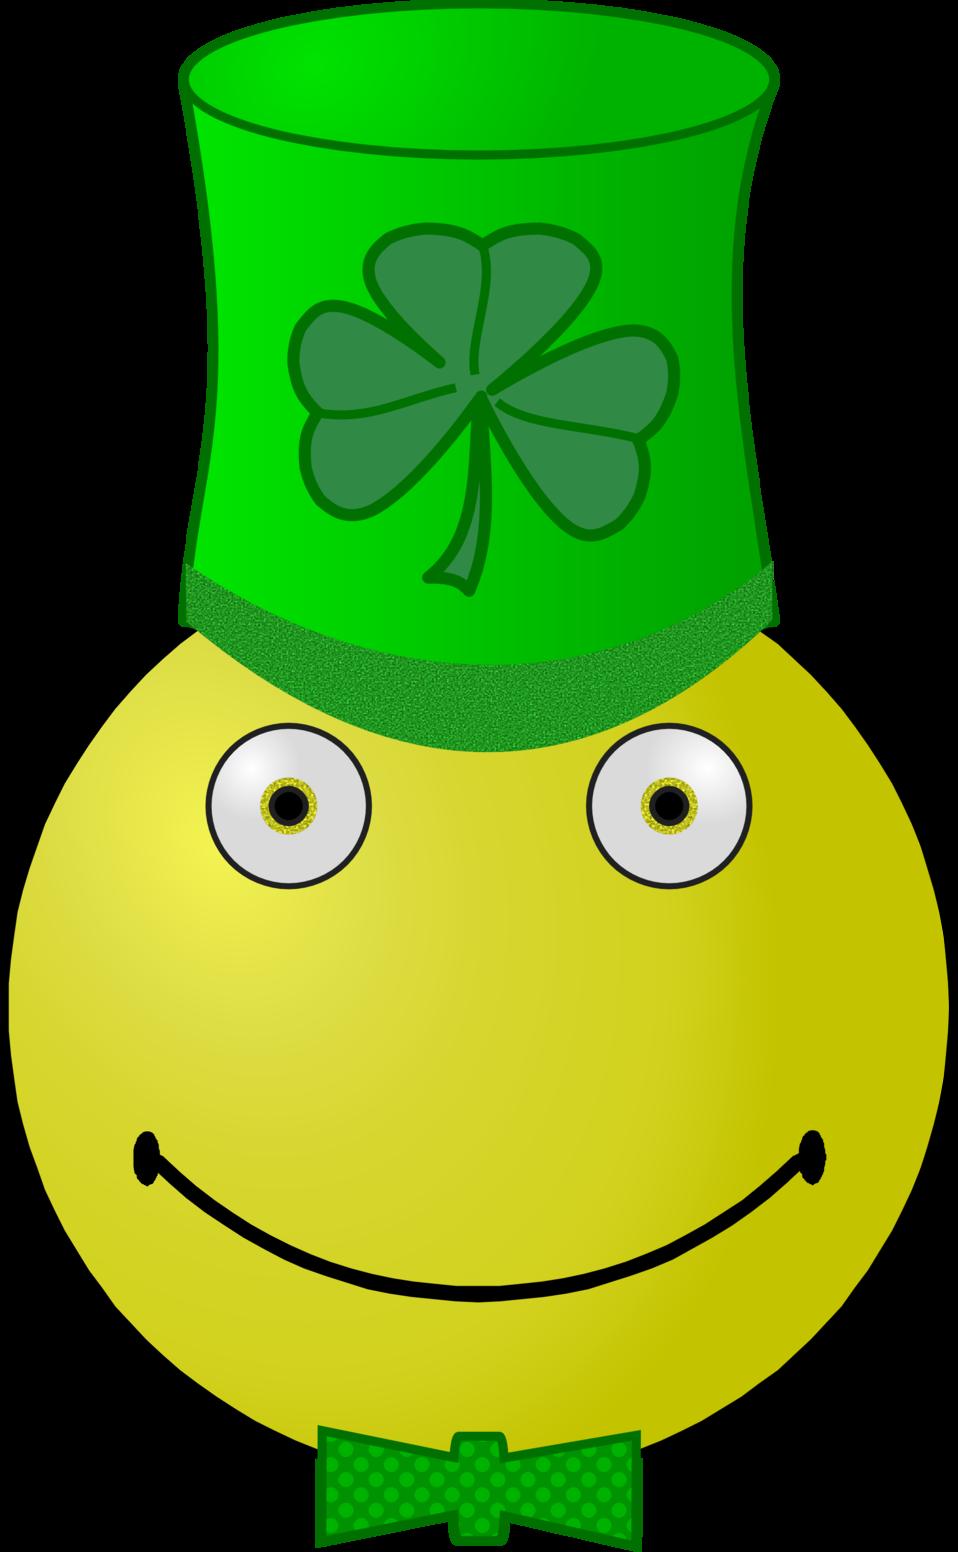 St. Patrick's Day smiley